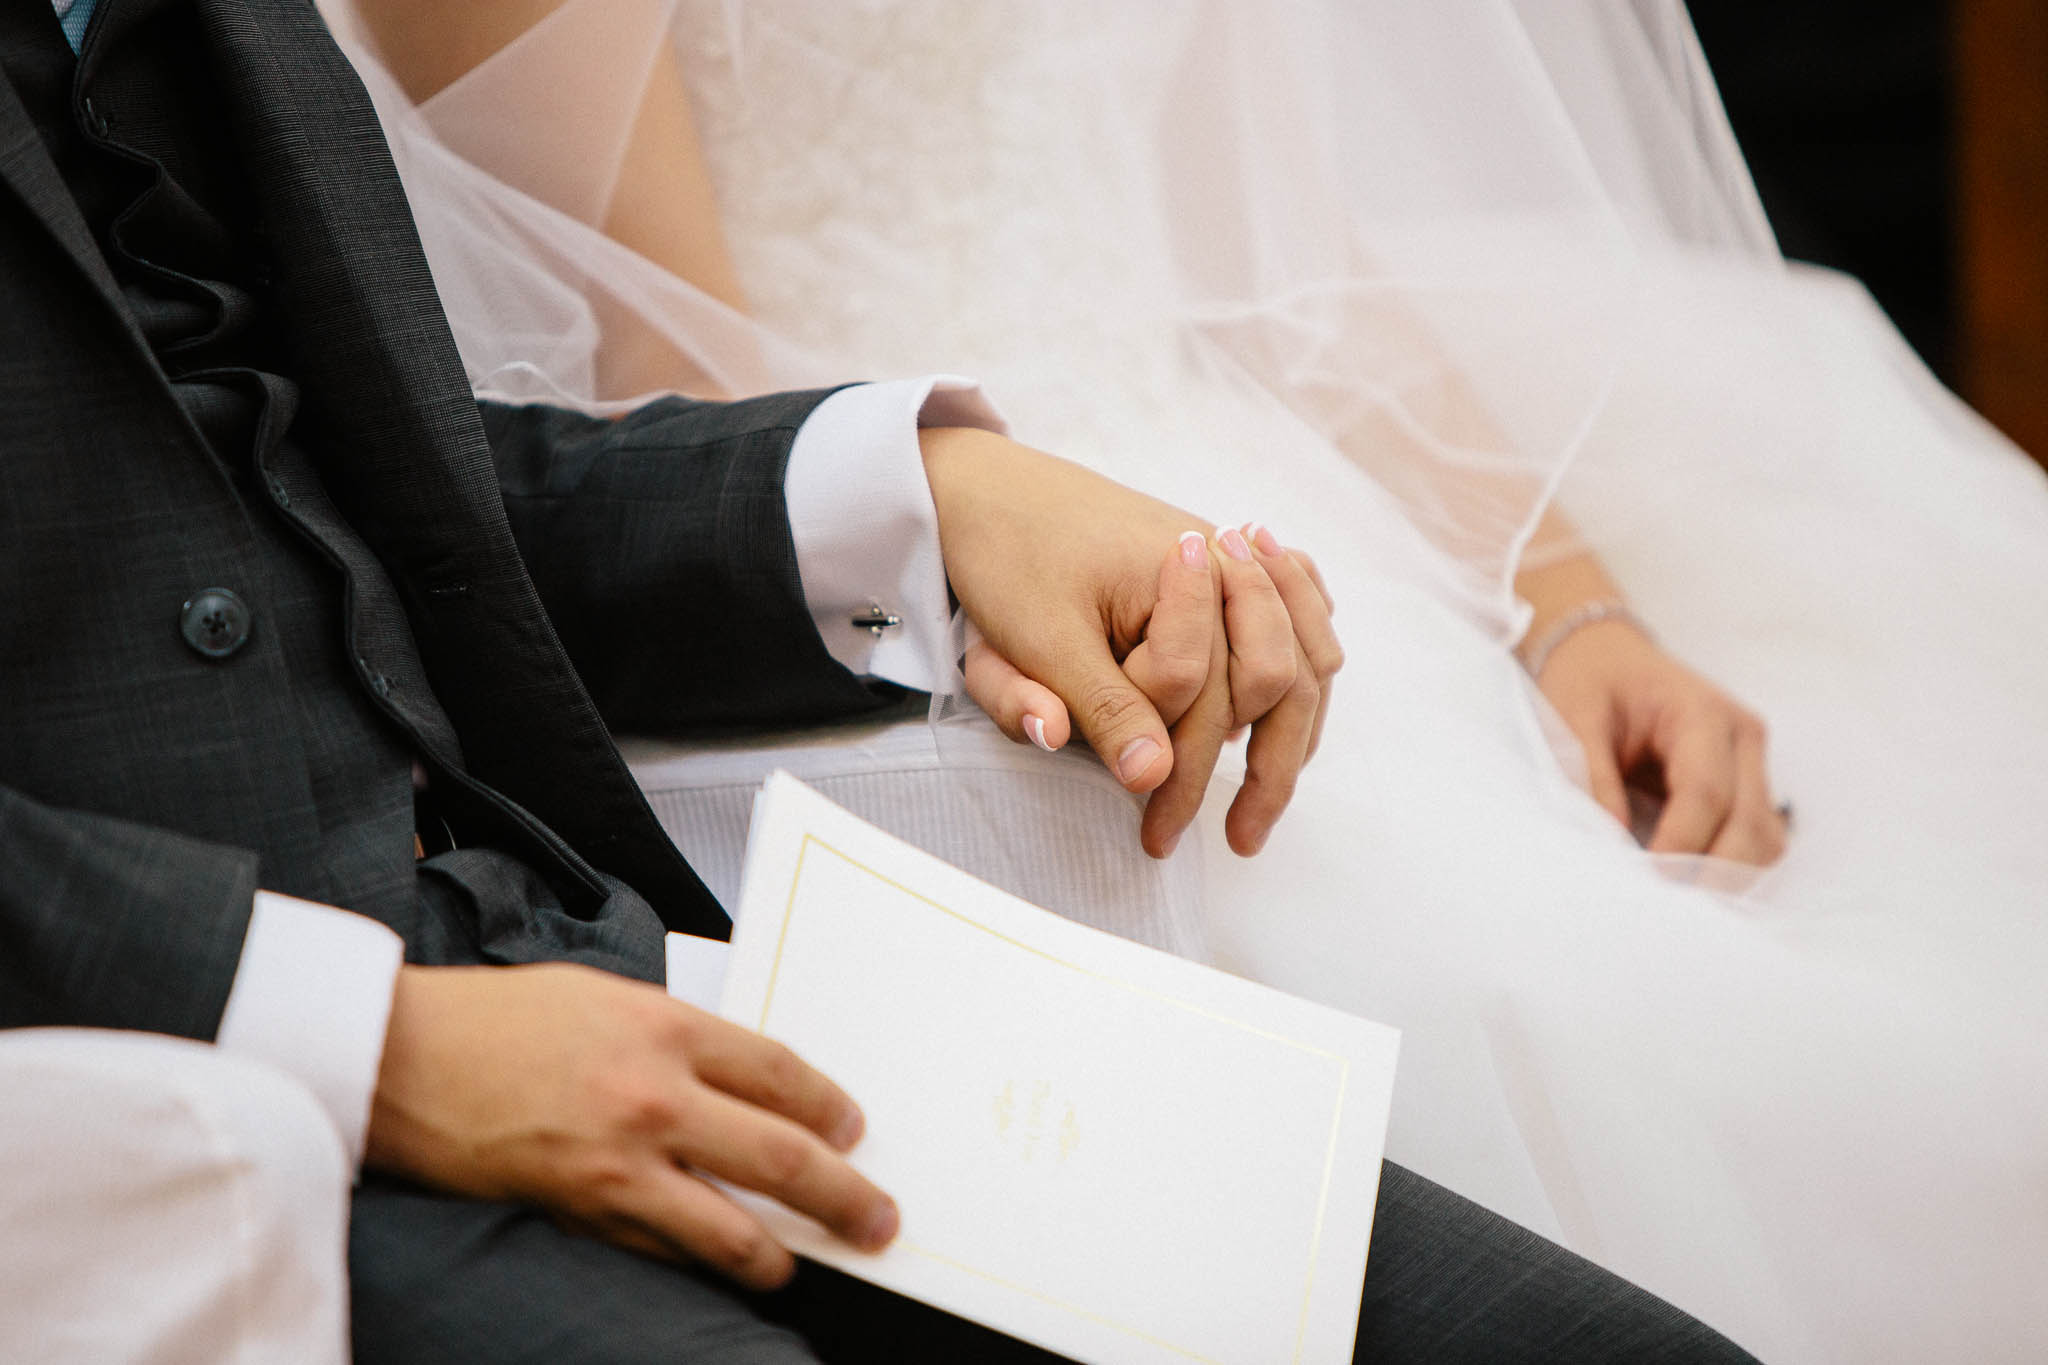 singapore-wedding-photographer-malay-indian-pre-wedding-travel-wmt-2015-jeremy-larissa-36.jpg